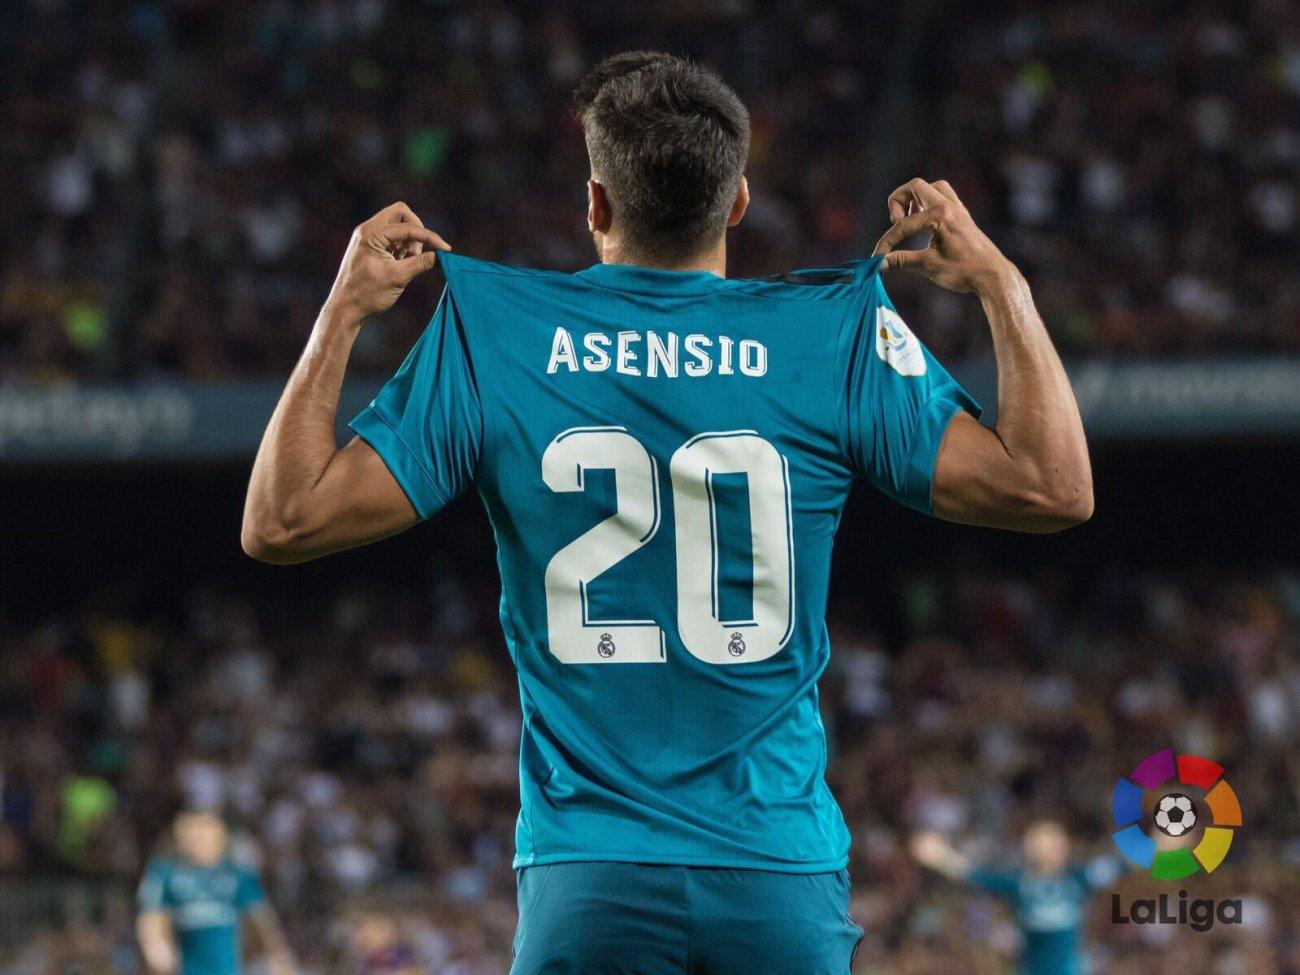 Asensio - supercopa